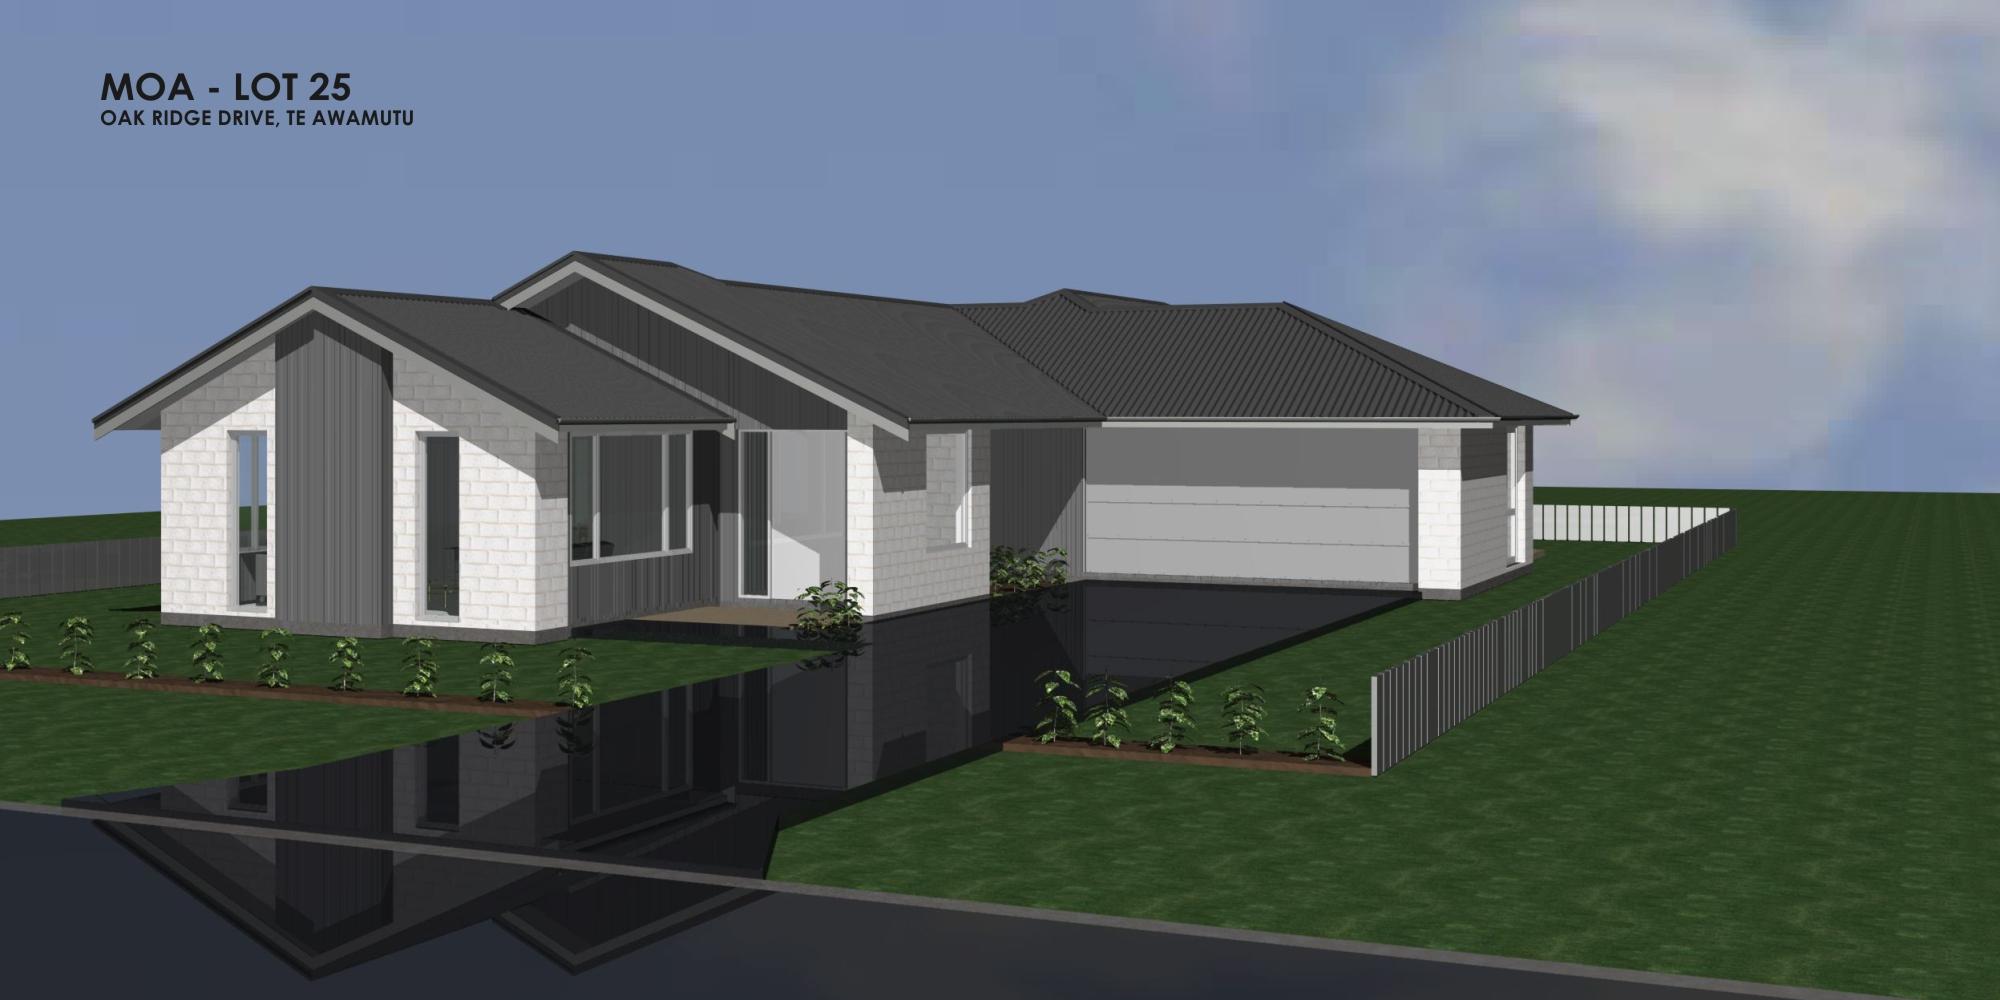 Moa Lot 25, Oak Ridge Drive, Te Awamutu